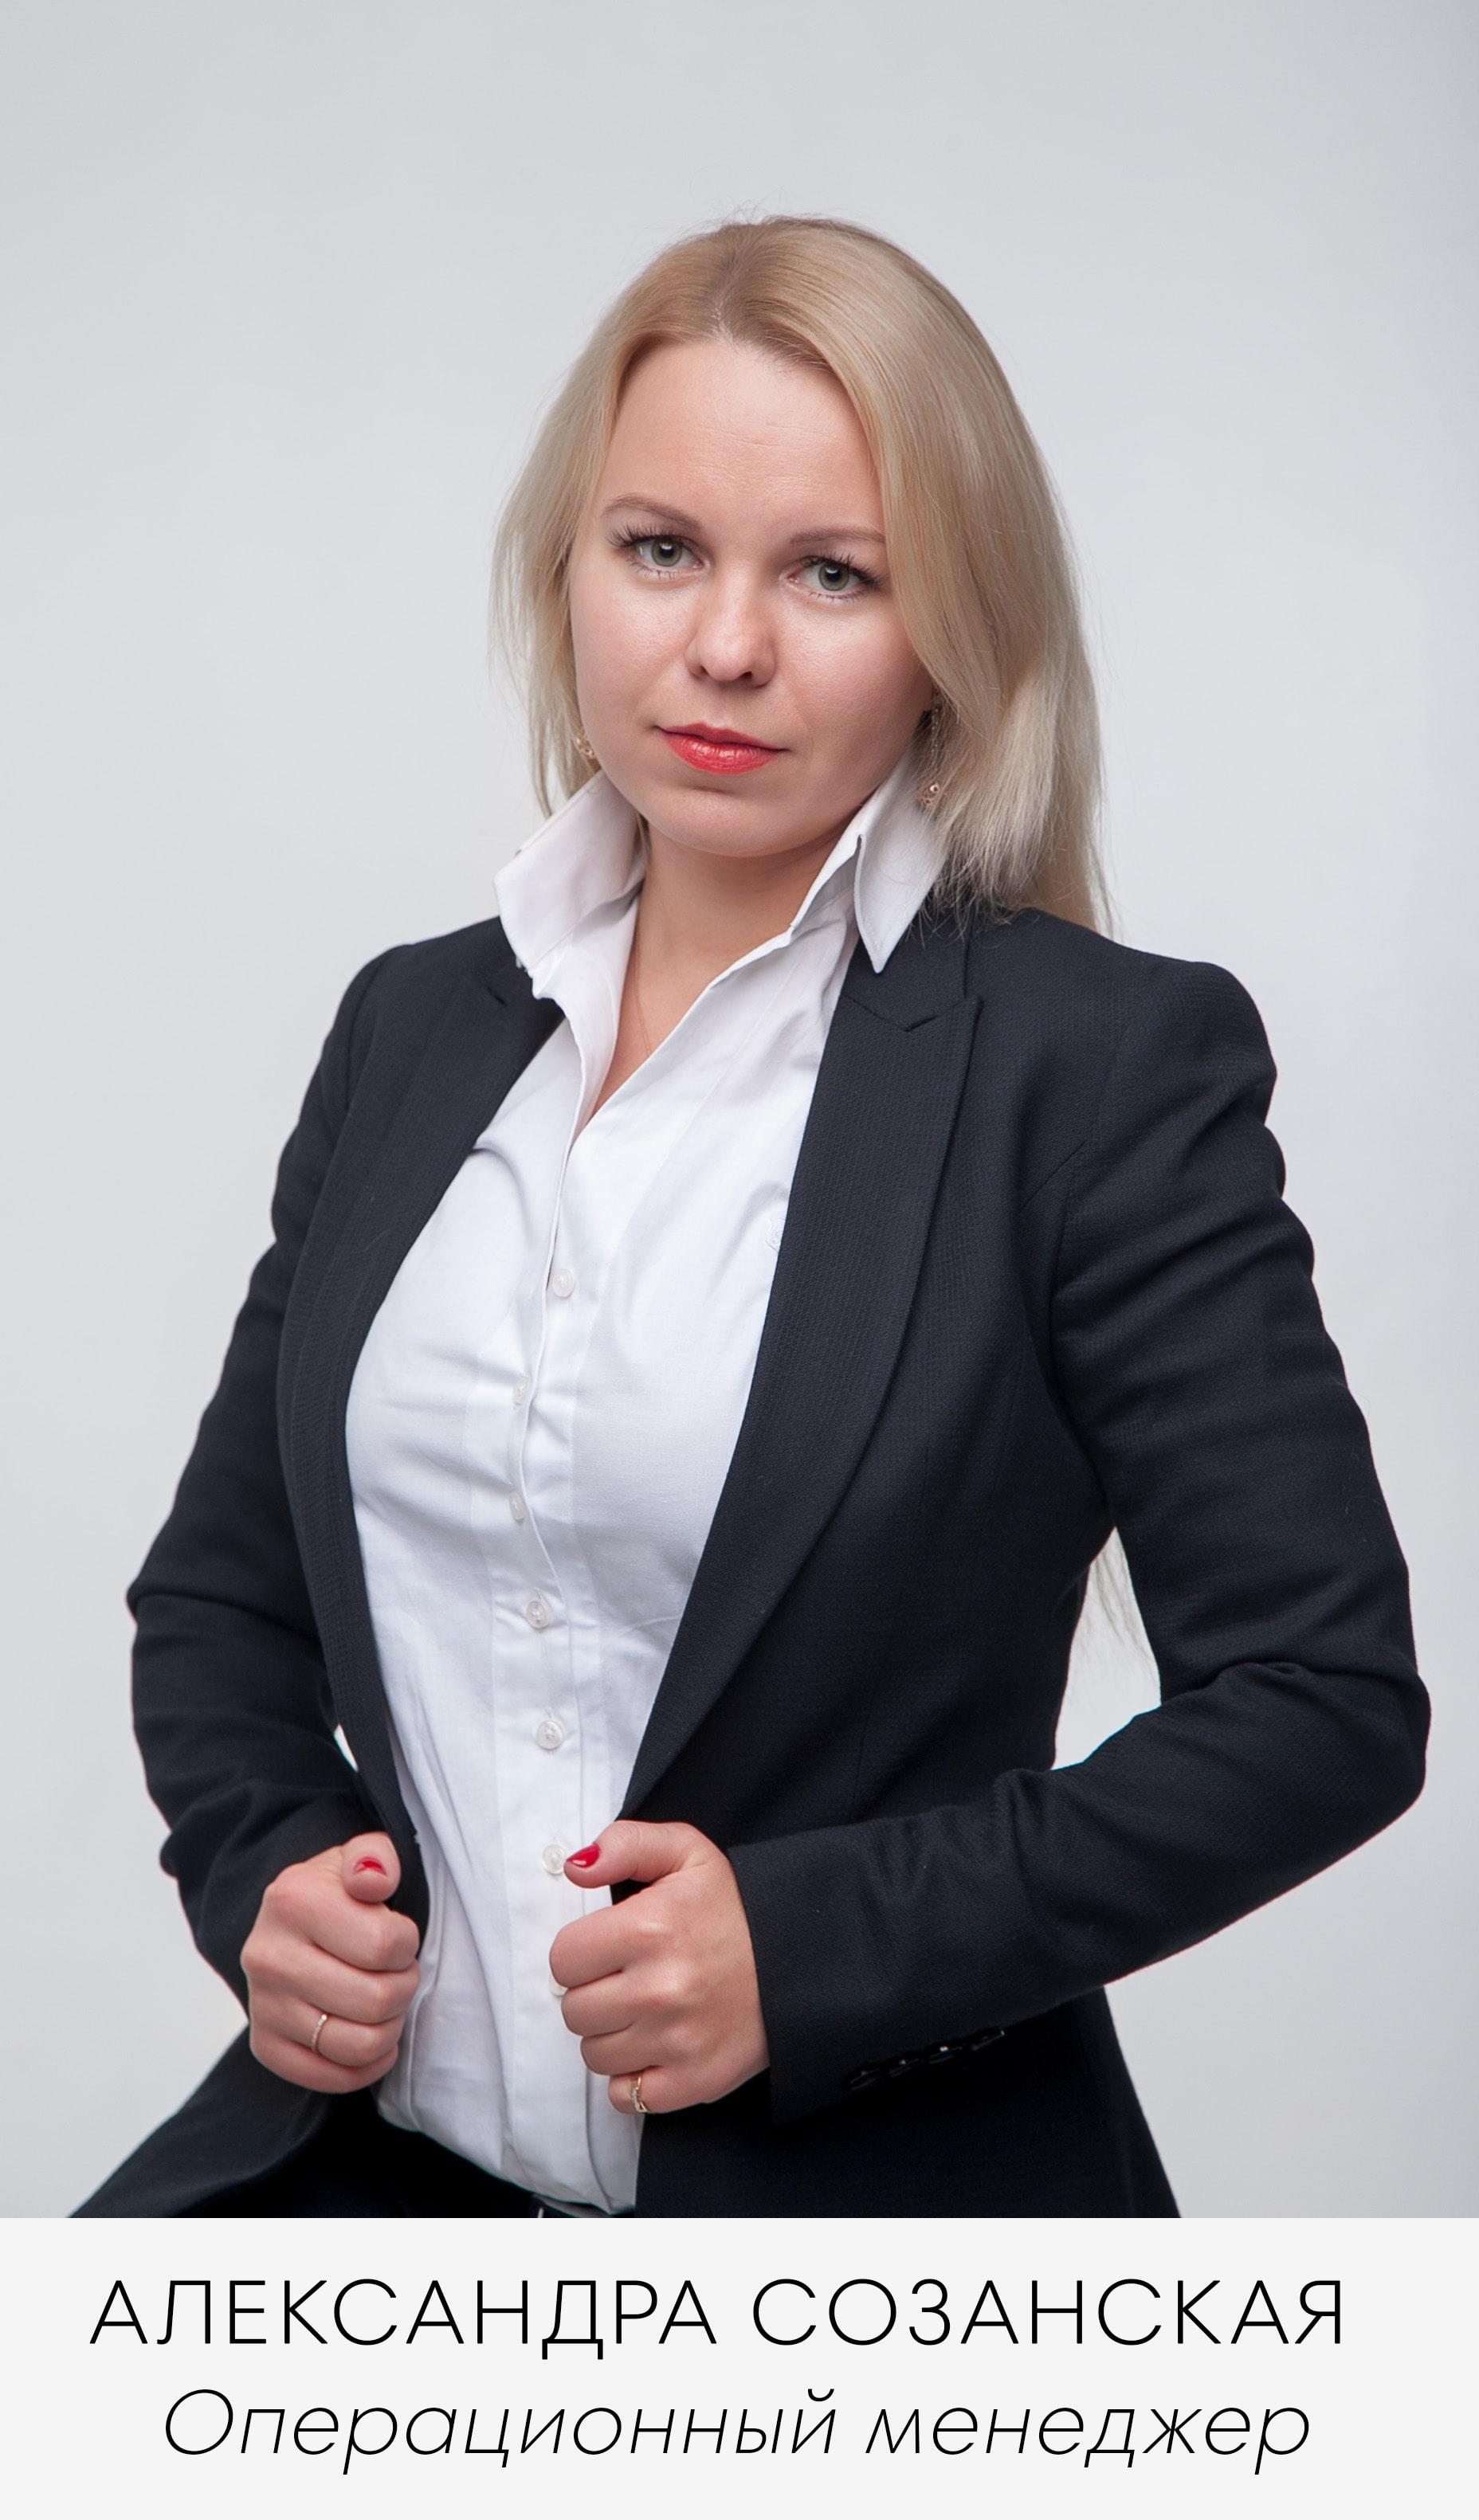 Alexandra-Sozanskaya-operation-manager-1-min.jpg